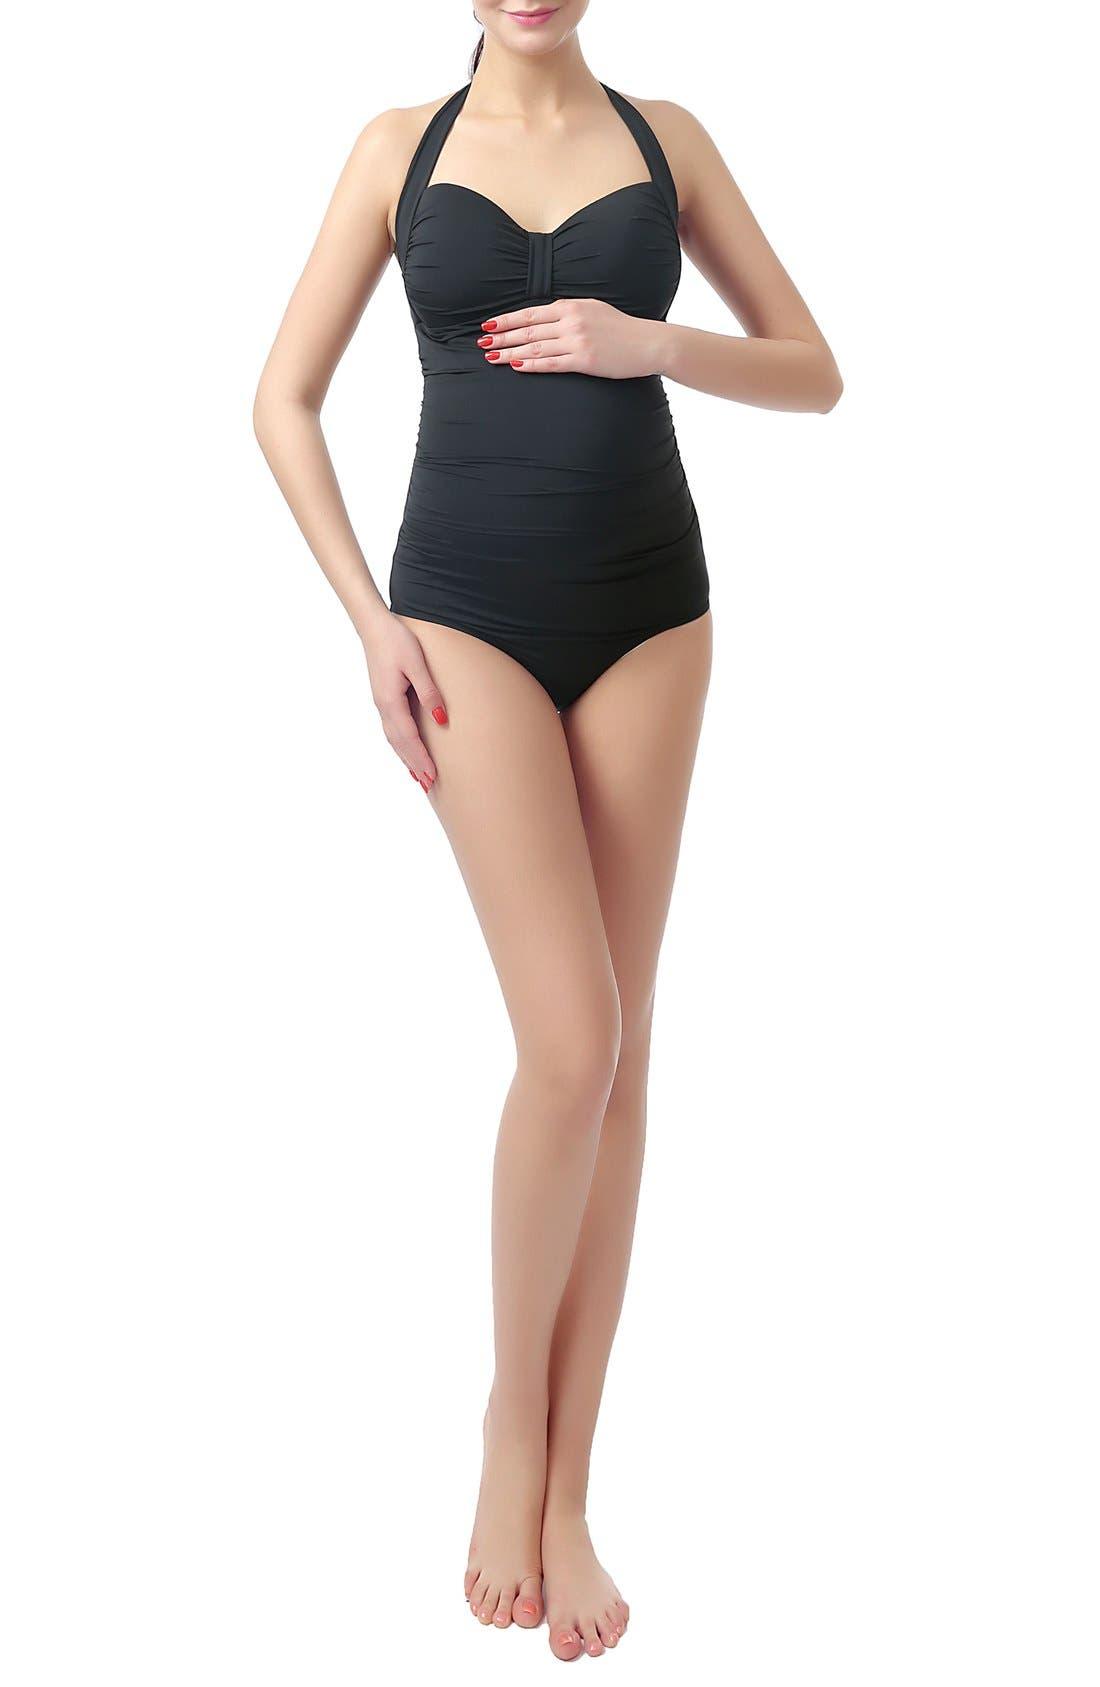 'Dana' Maternity One-Piece Halter Swimsuit,                             Main thumbnail 1, color,                             BLACK